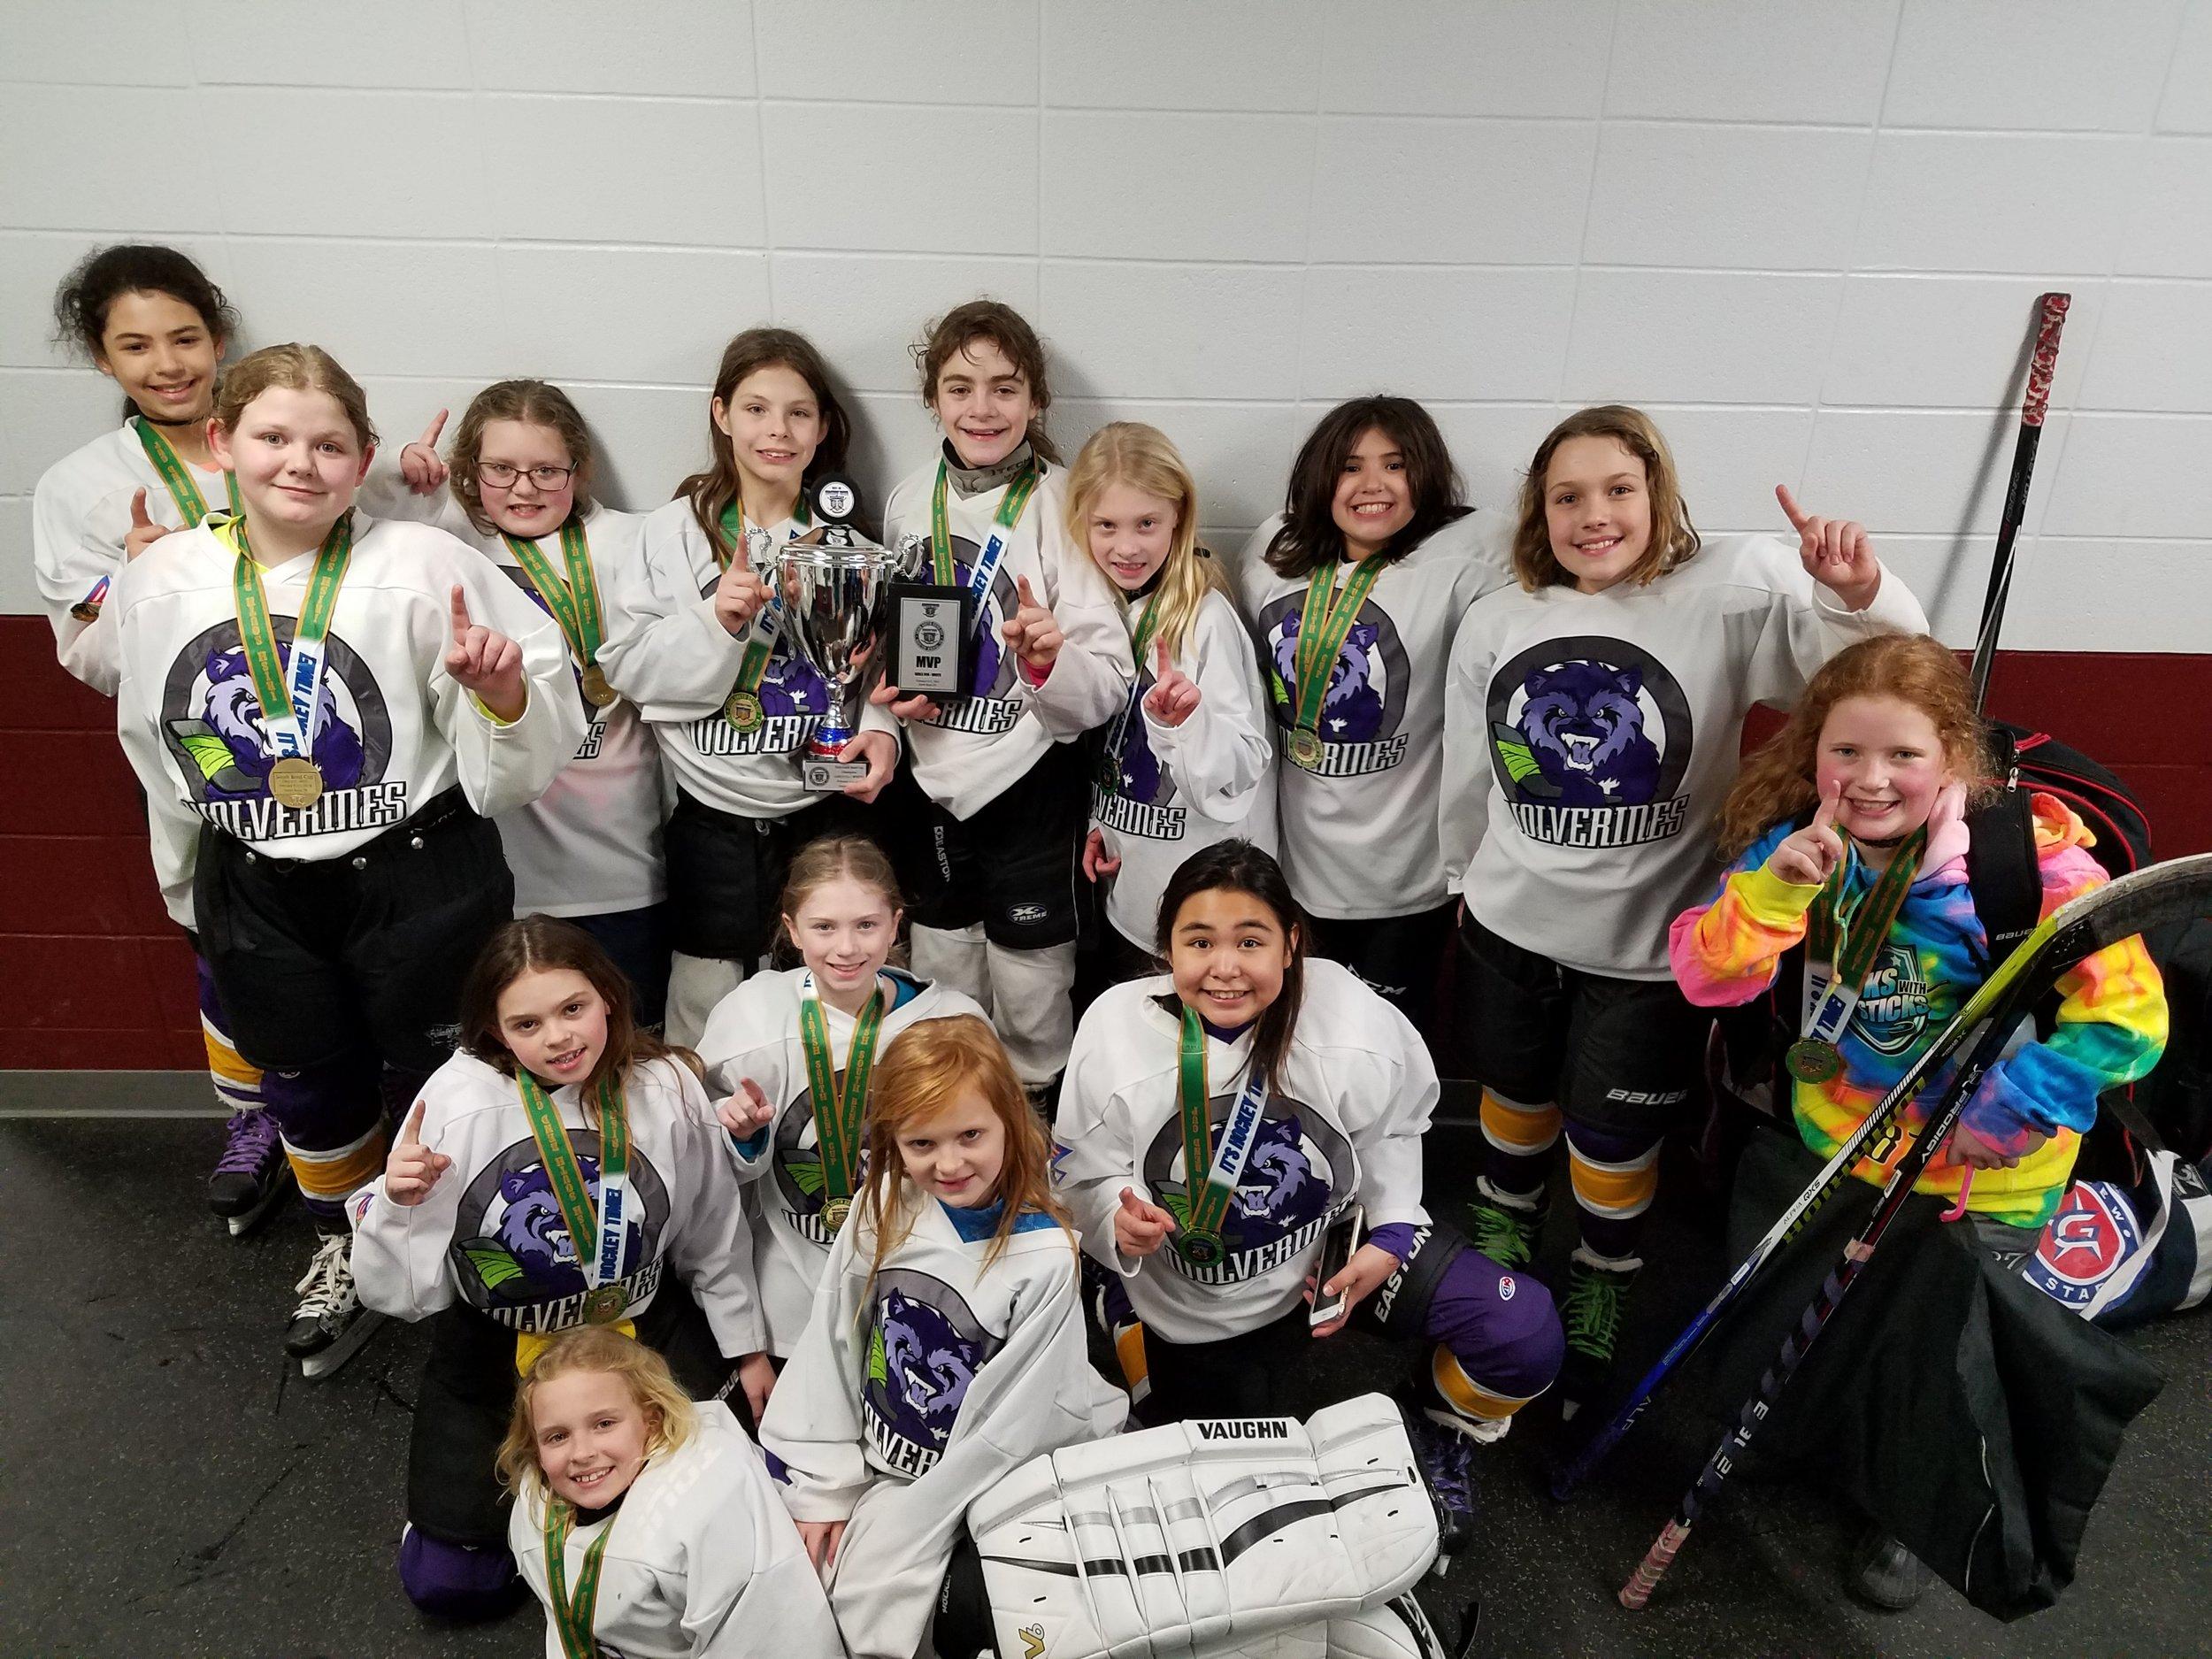 U10 champions at Girls Irish South Bend Cup, Feb 2018